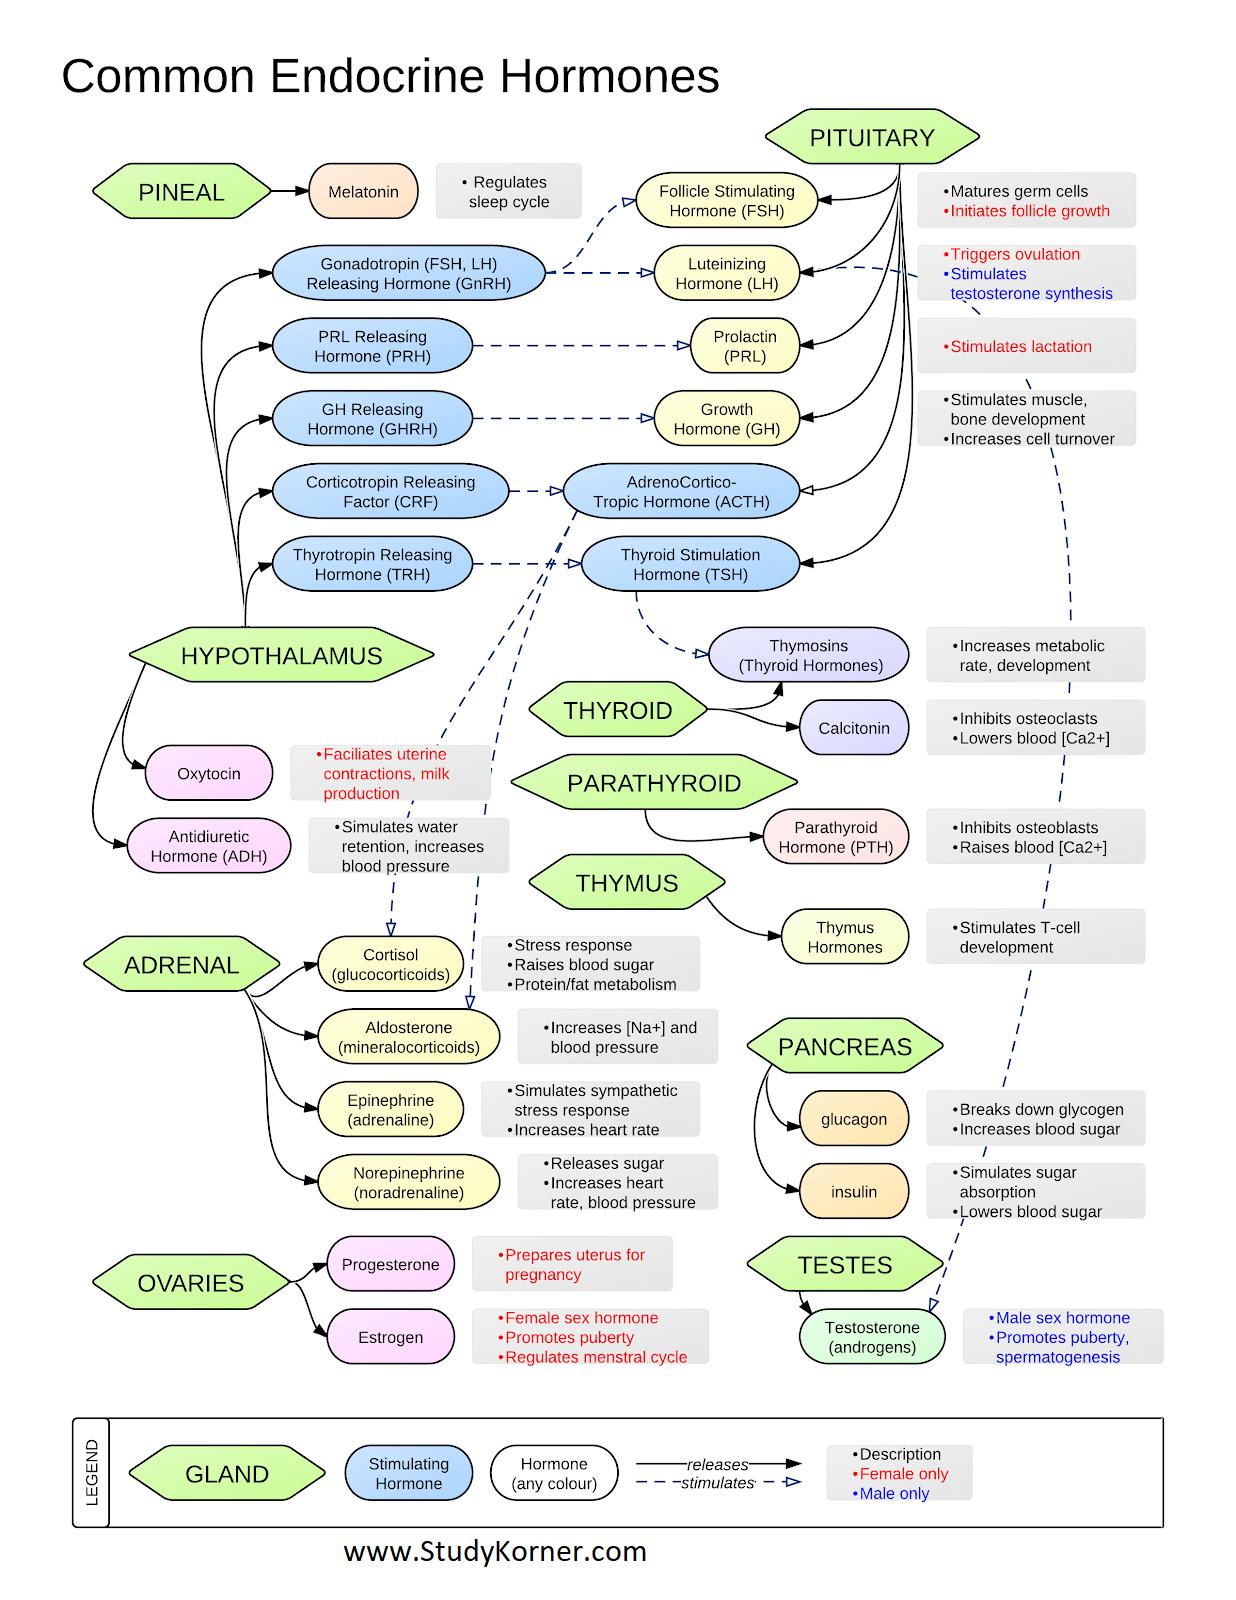 Common Endocrine Hormones Chart Endocrine hormones